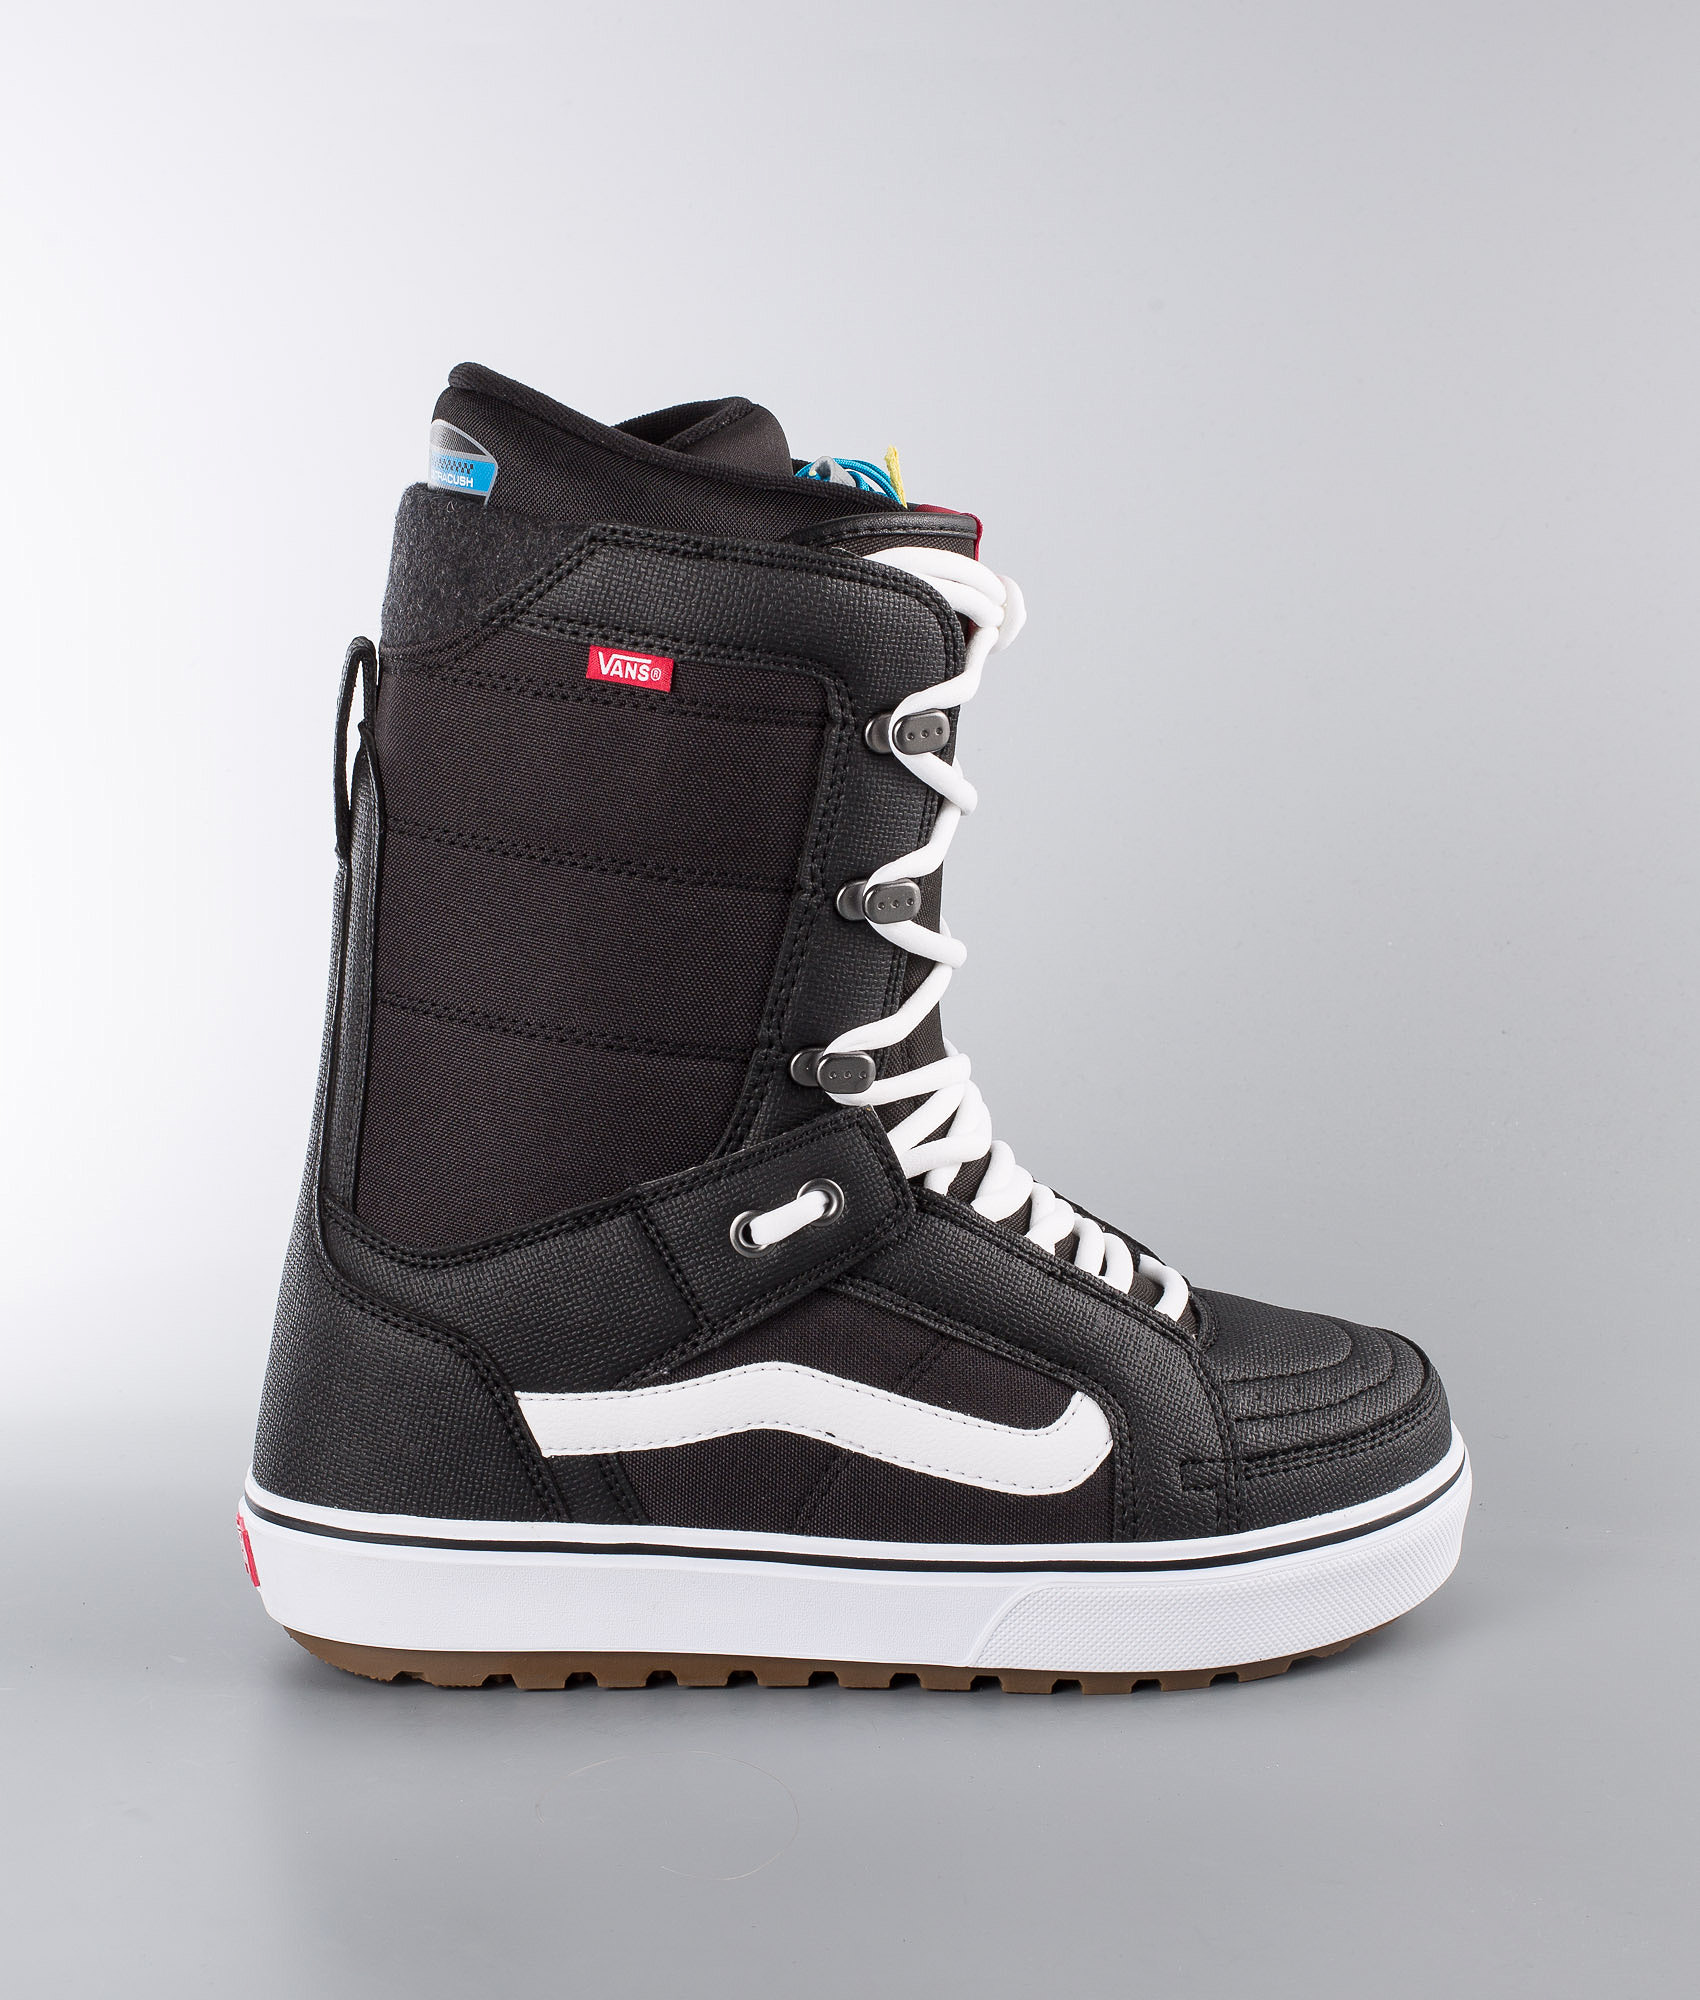 4541d4d649 Vans Hi-Standard OG Snowboard Boots Black White - Ridestore.com